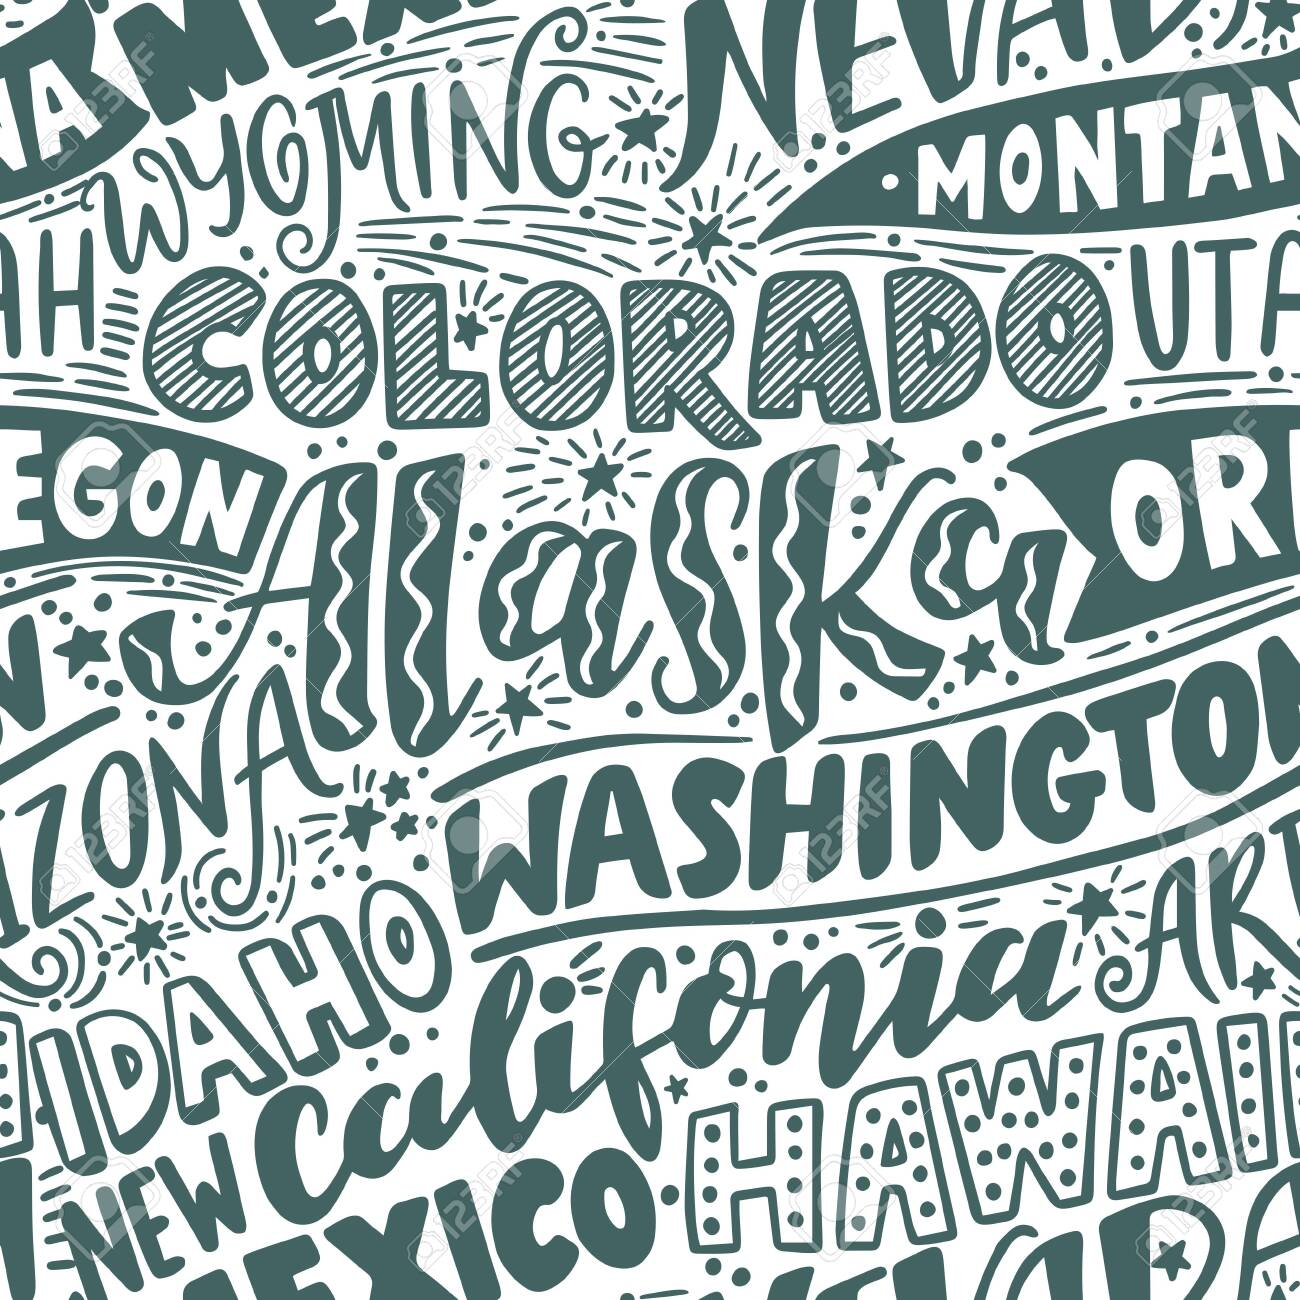 Vector seamless pattern with USA states. Washington, California, Oregon, Alaska, Colorado, Wyoming, Nevada, Montana, Utah, Idaho, Arizona, Hawaii, New Mexico - 149966307